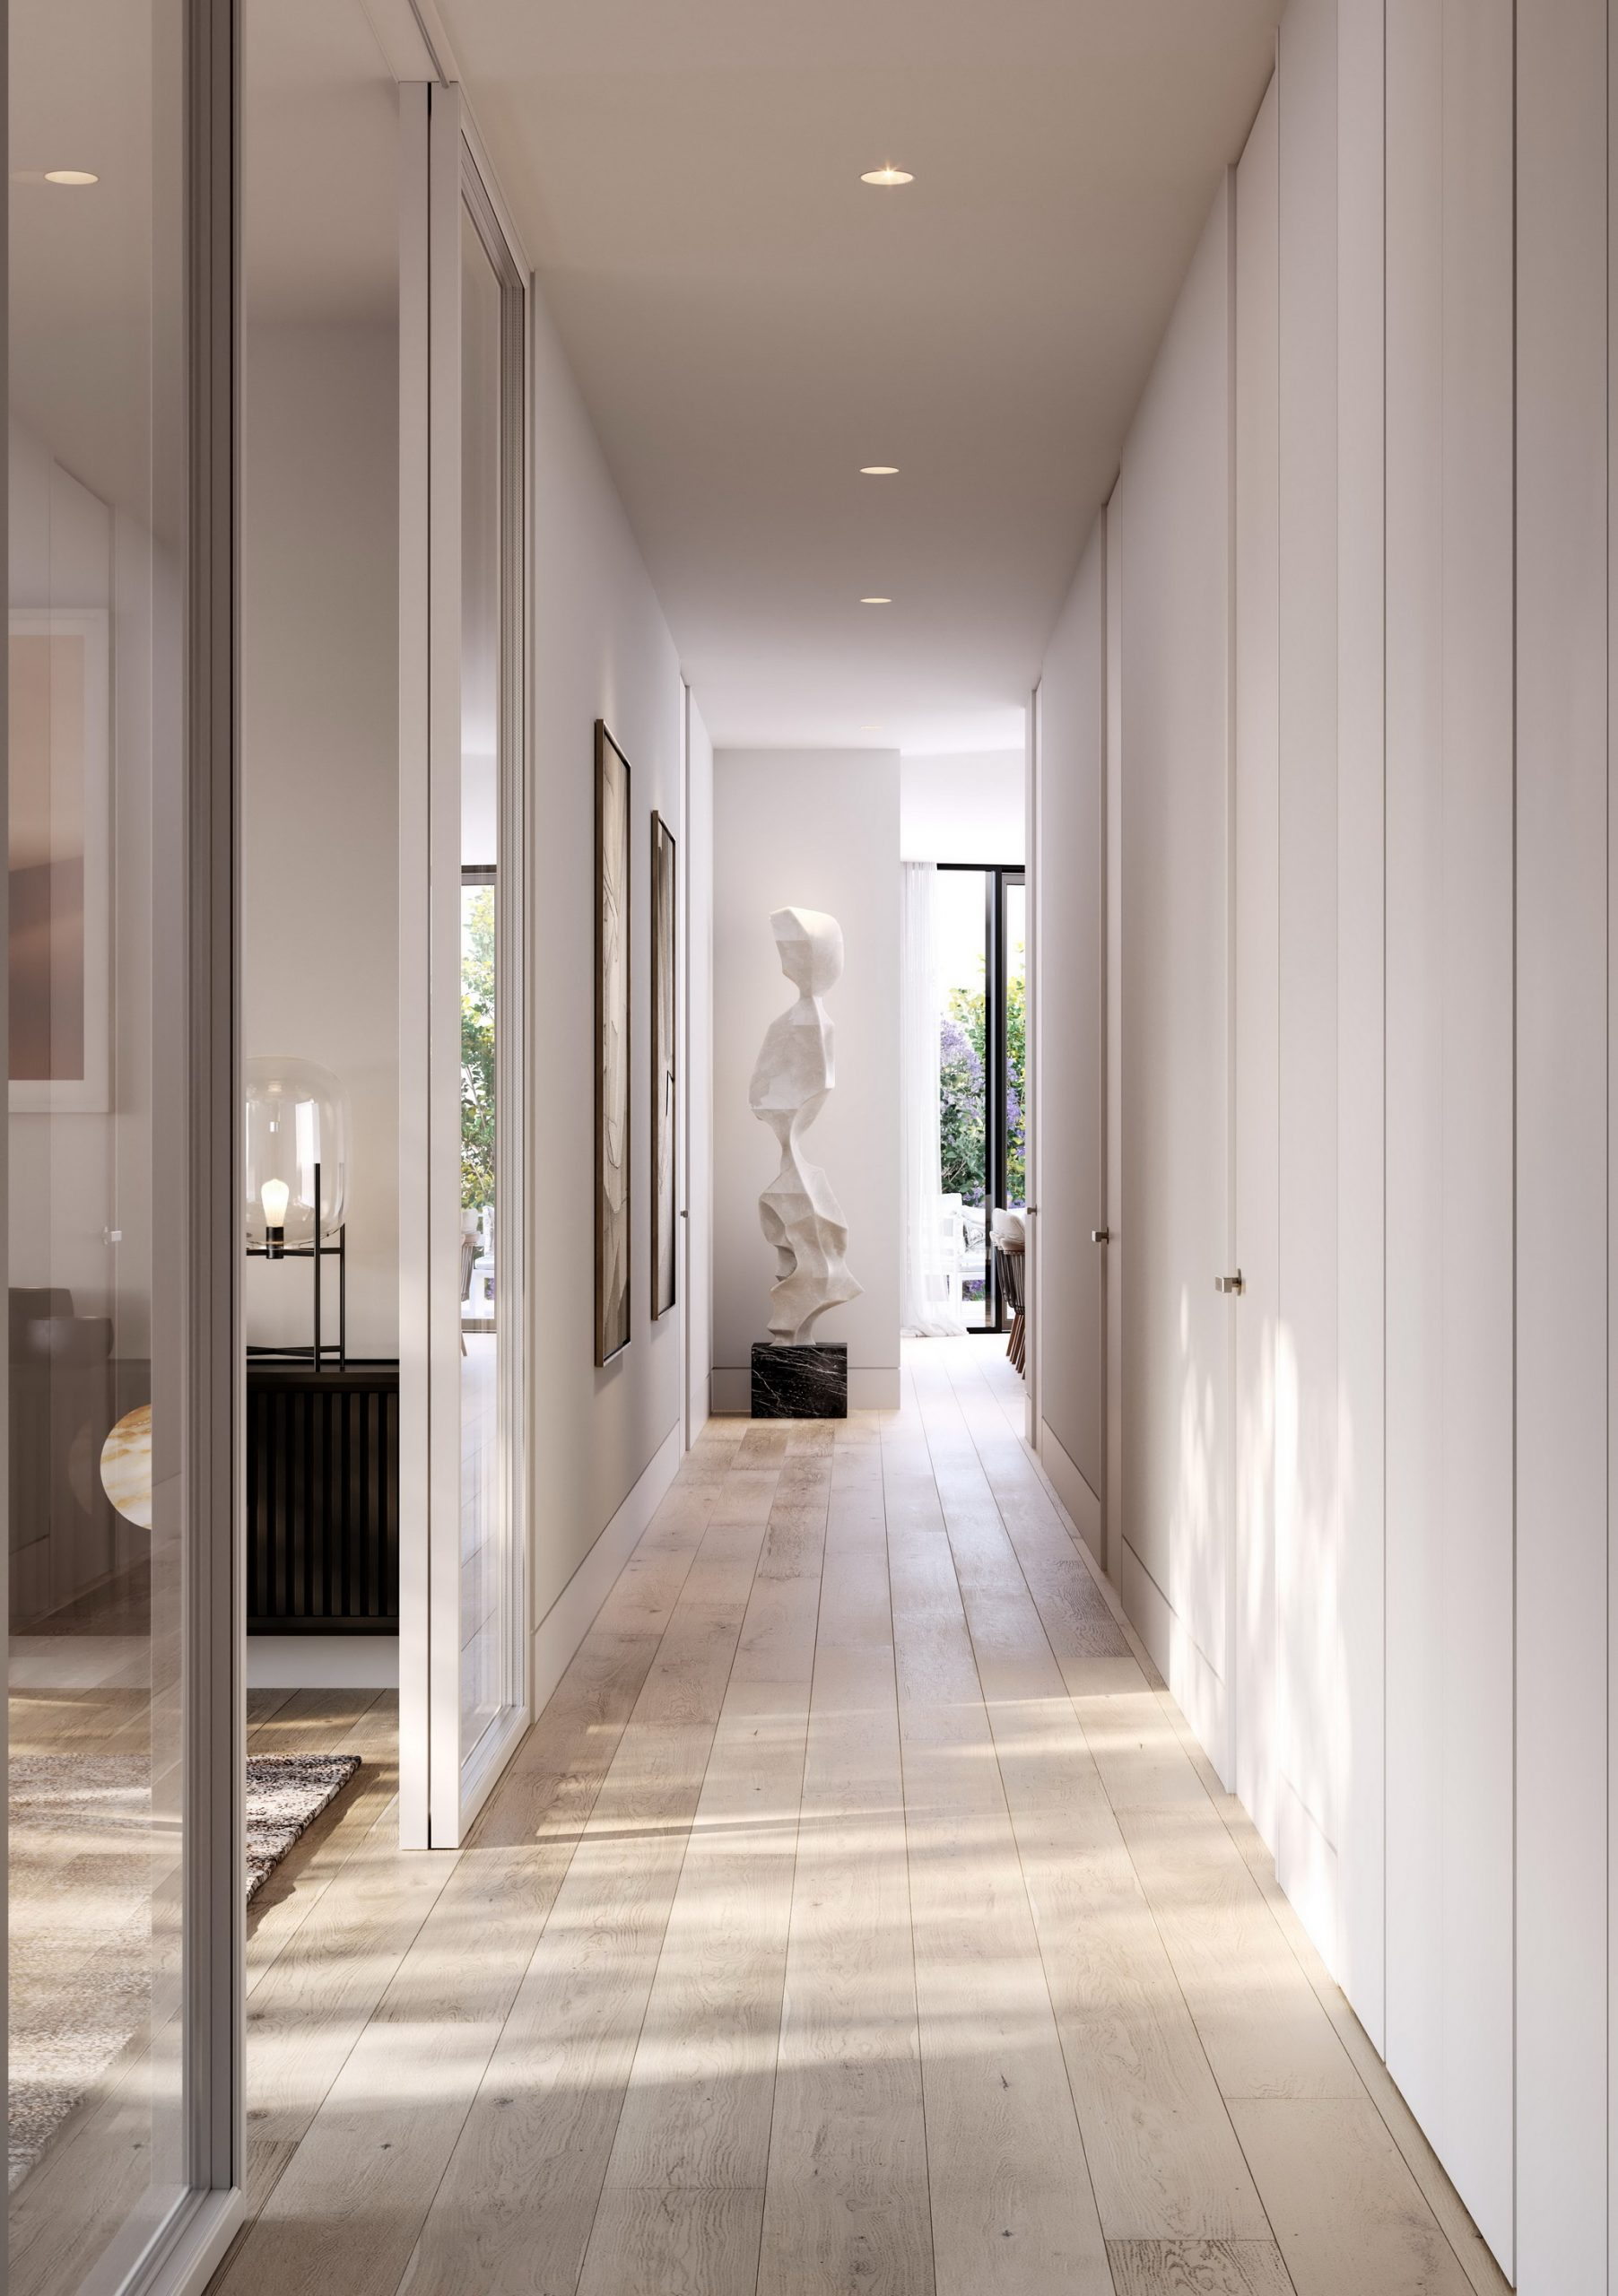 fkd-studio-3d-archiecture-visualisation-cgi-archviz-eaglemont-interior-hallway-entrance